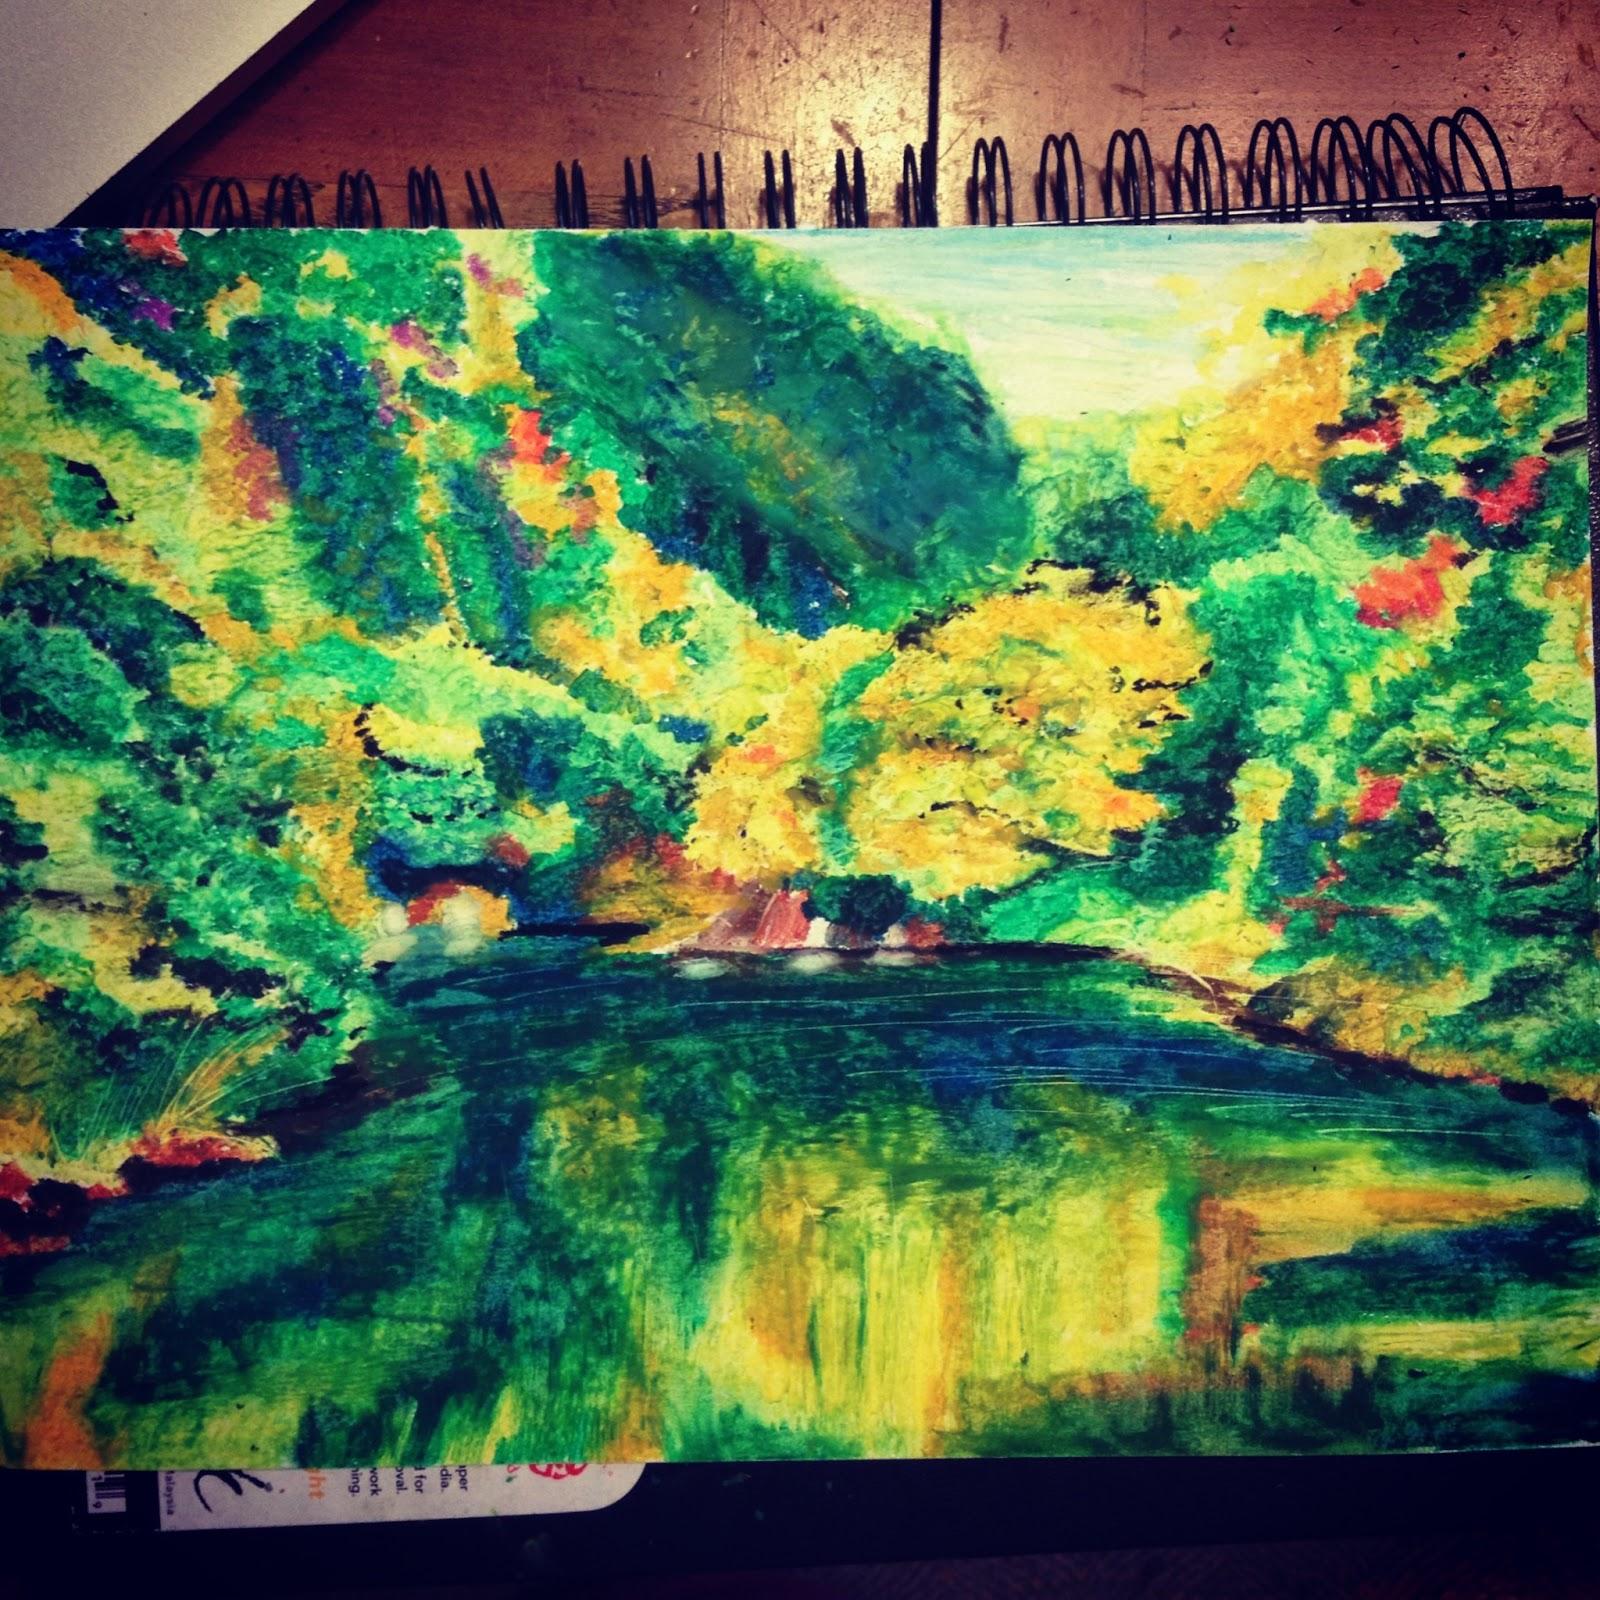 The Art of Art: Oil Pastels